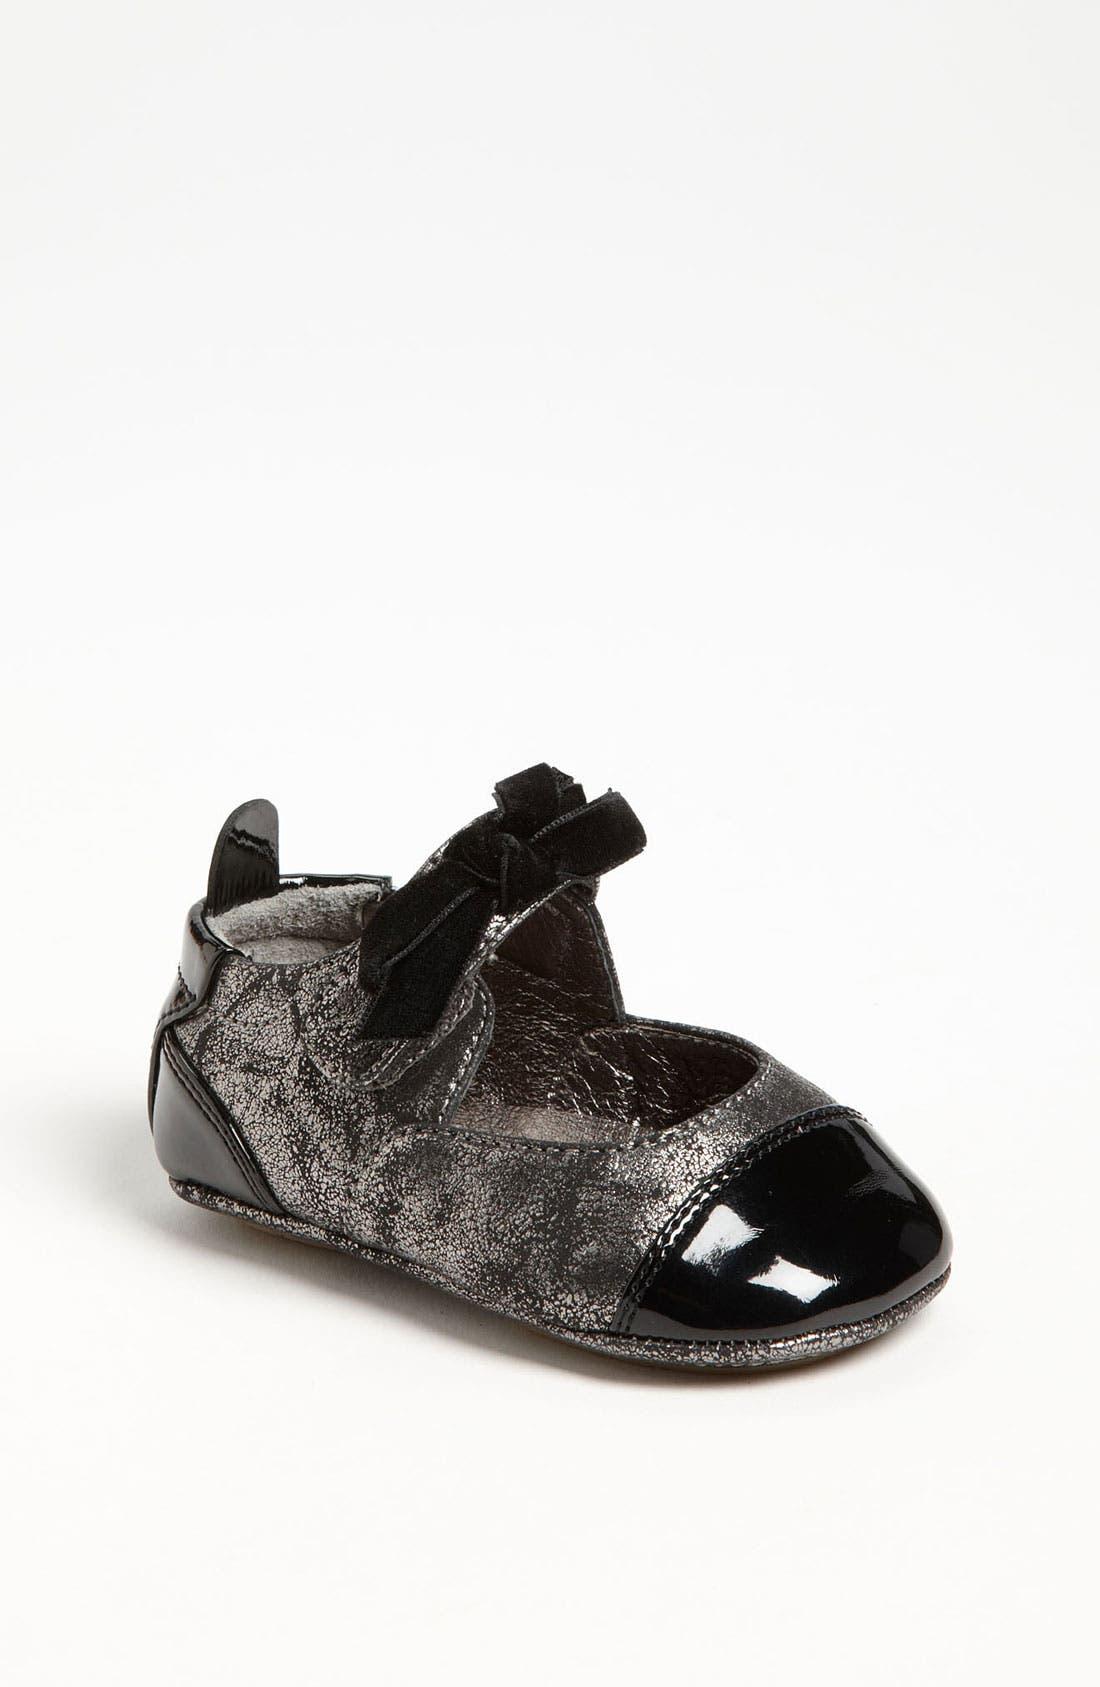 Main Image - Cole Haan 'Mini Cap Toe' Leather Crib Shoe (Baby)